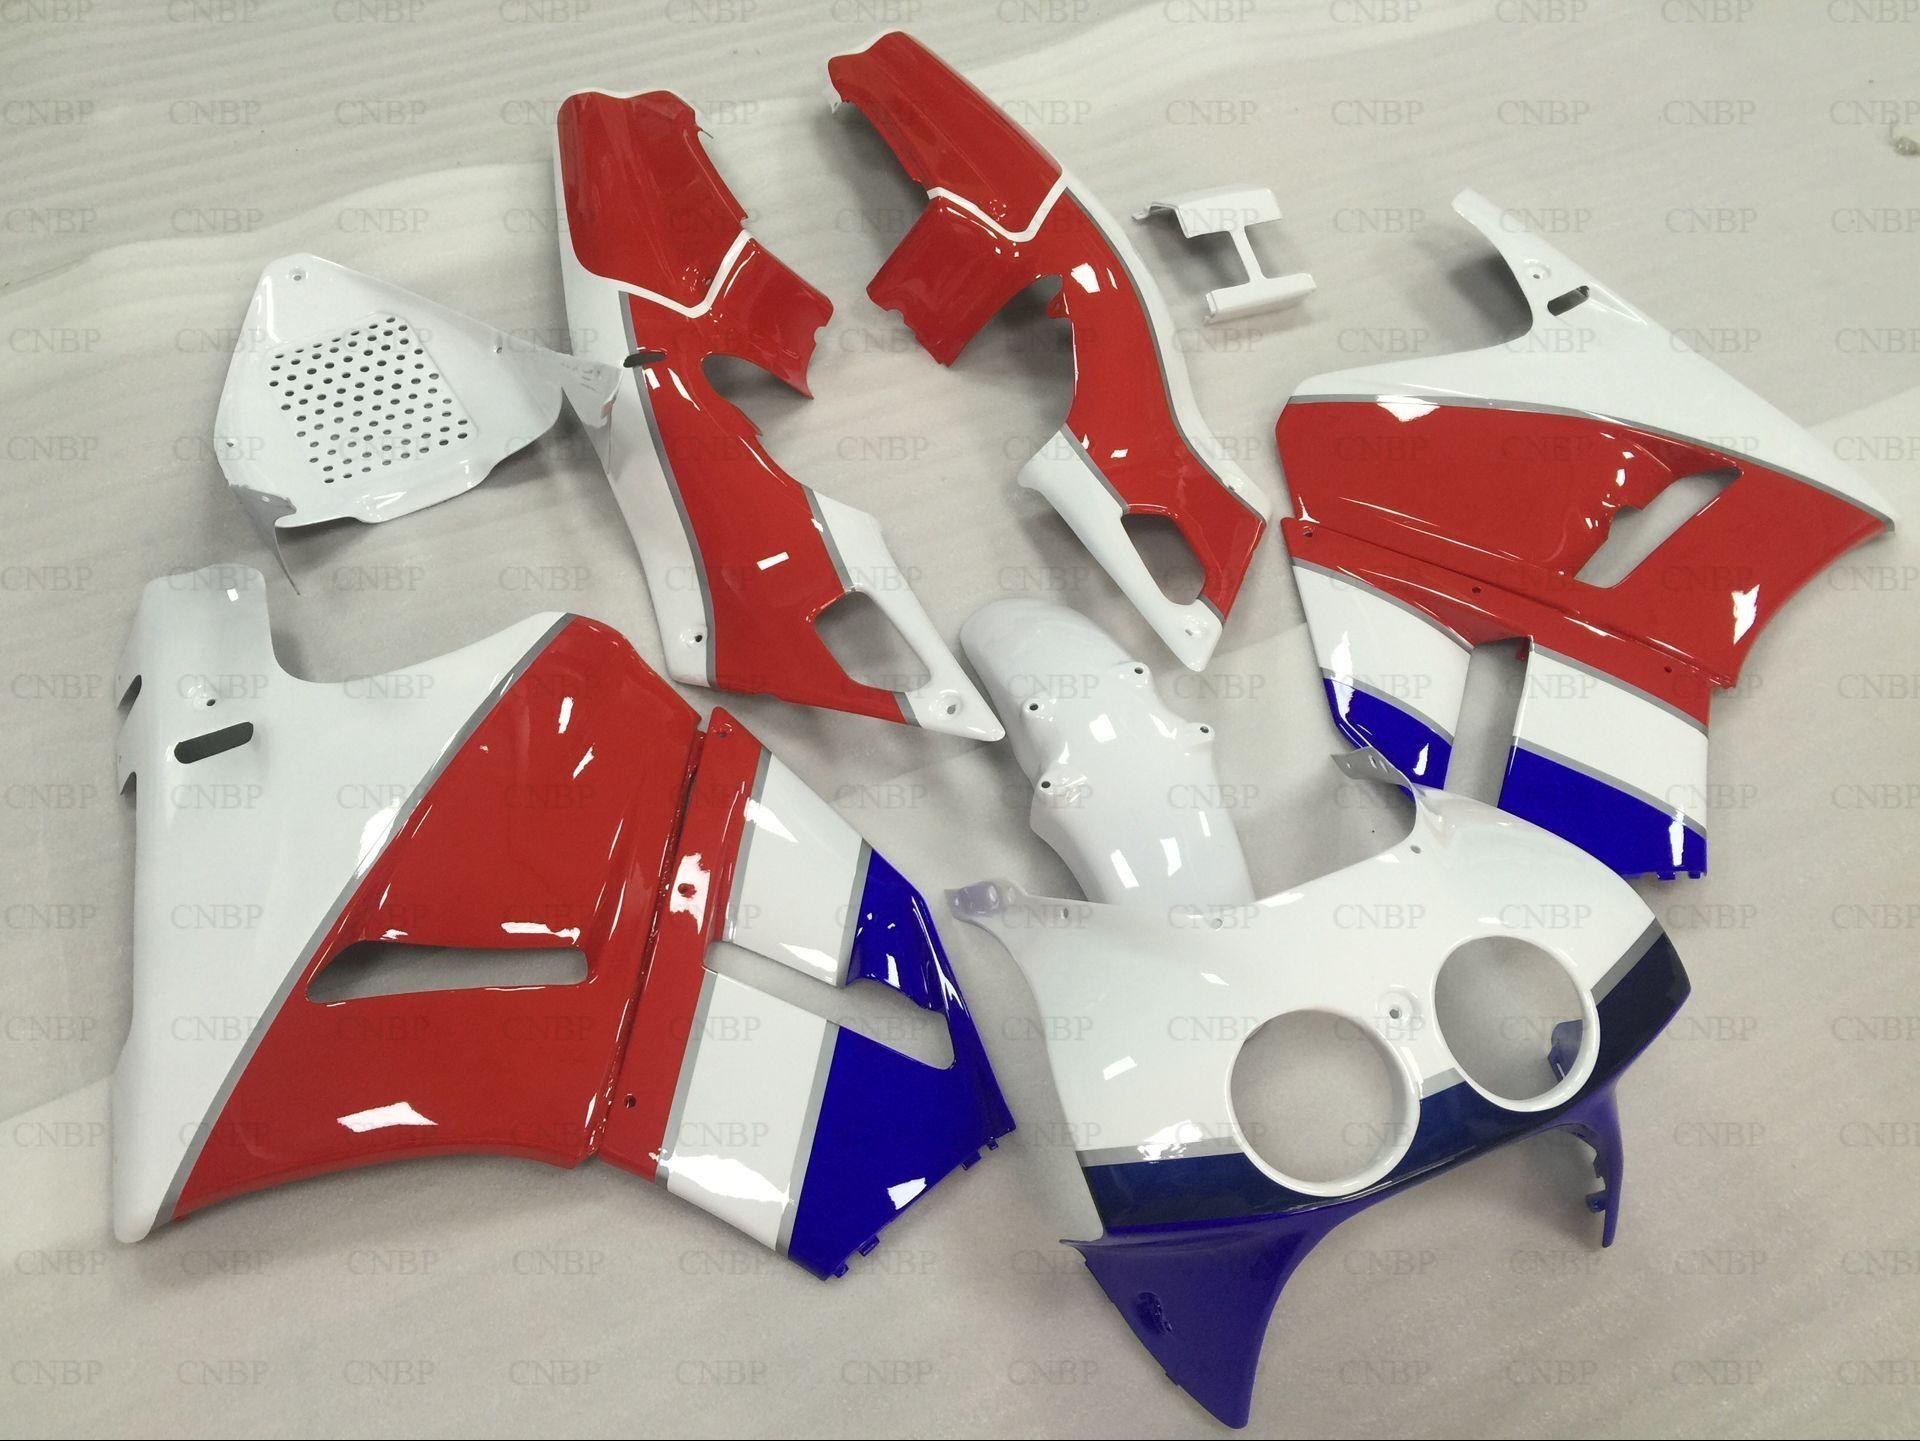 Verkleidung Kits VFR400R 1990 Verkleidung für Honda VFR400 1992 1988-1992 NC30 V4 Rot Weiß Blau Karosserie für Honda VFR400 1991